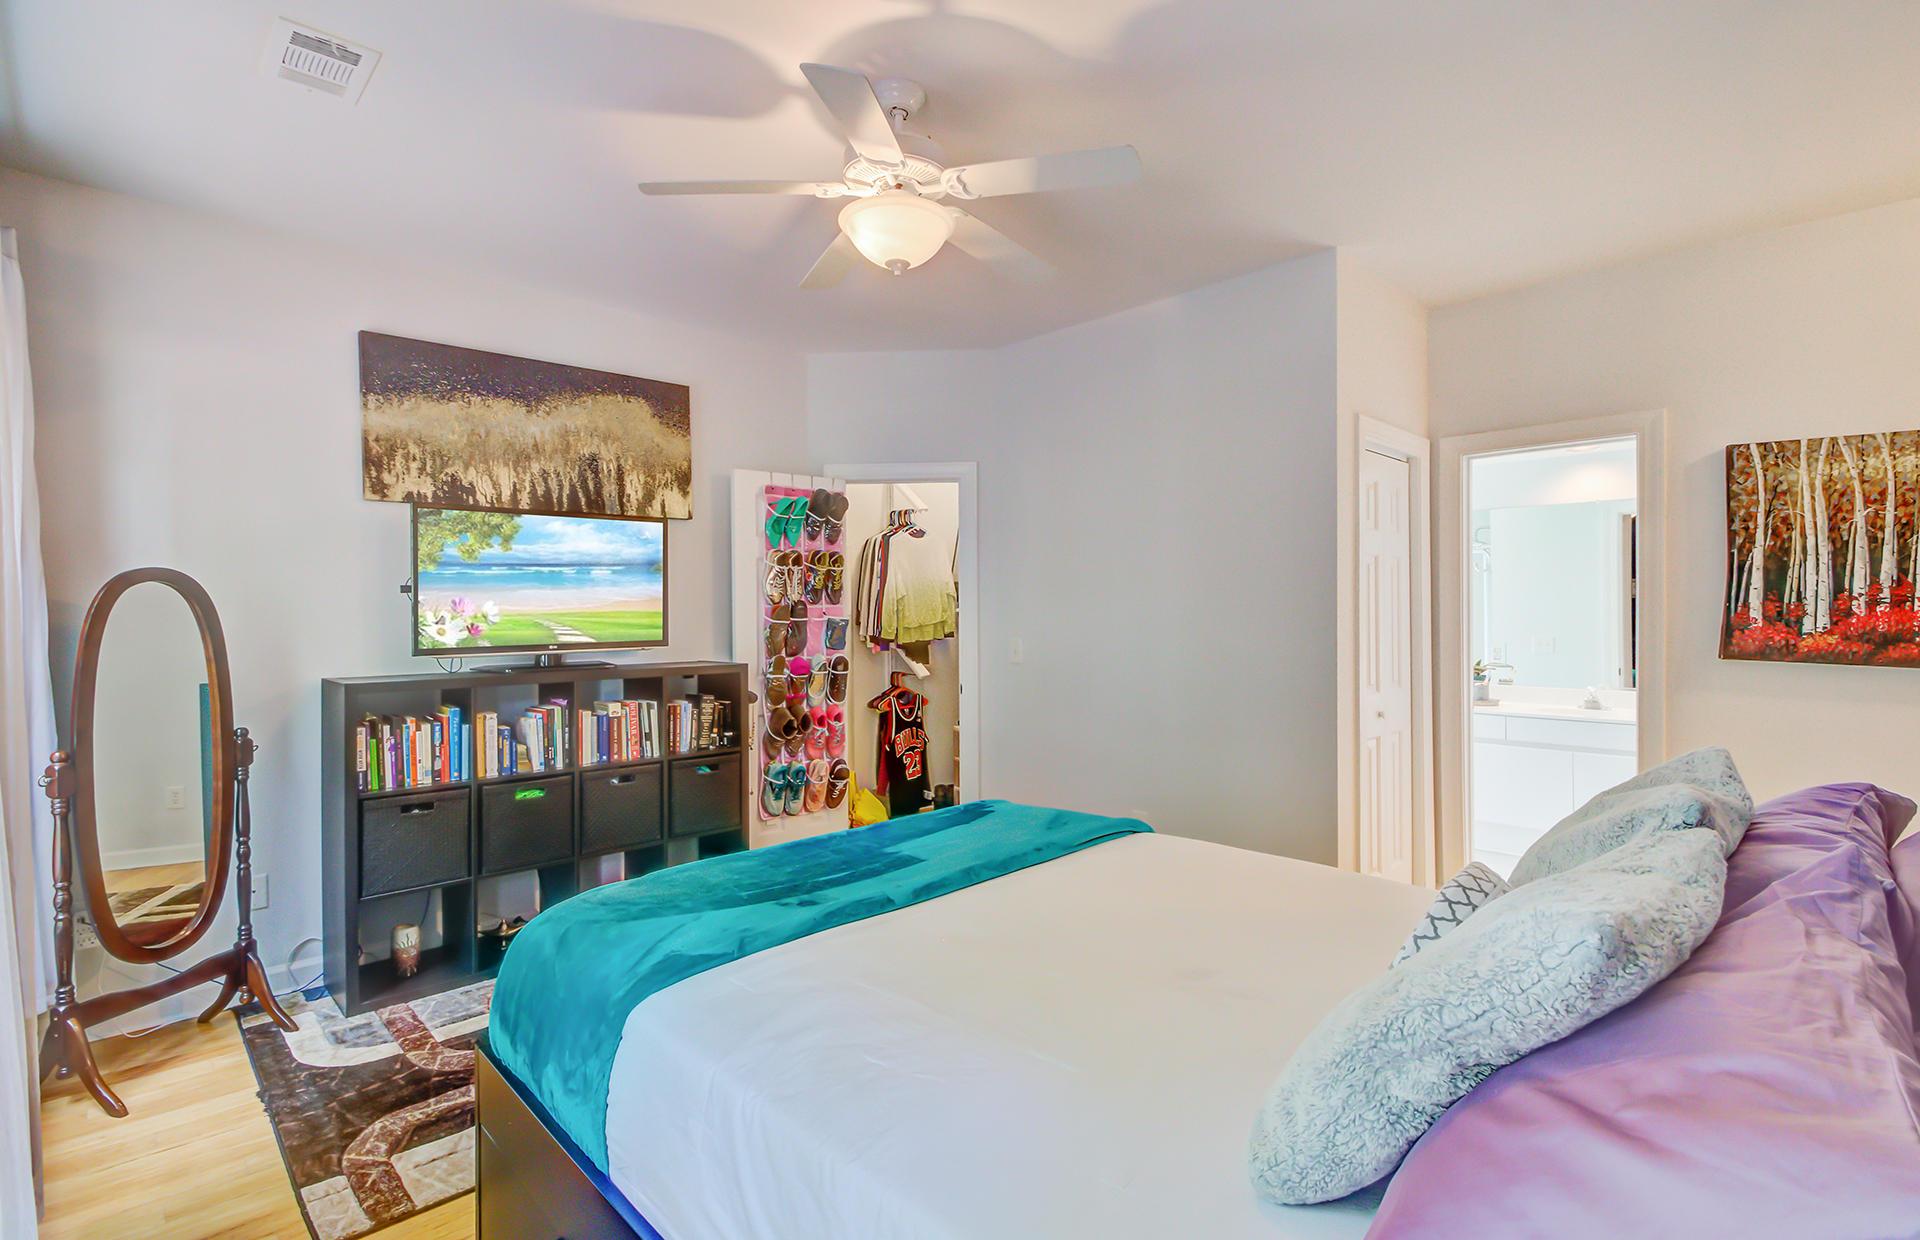 Dunes West Homes For Sale - 1566 Oxborough, Mount Pleasant, SC - 15